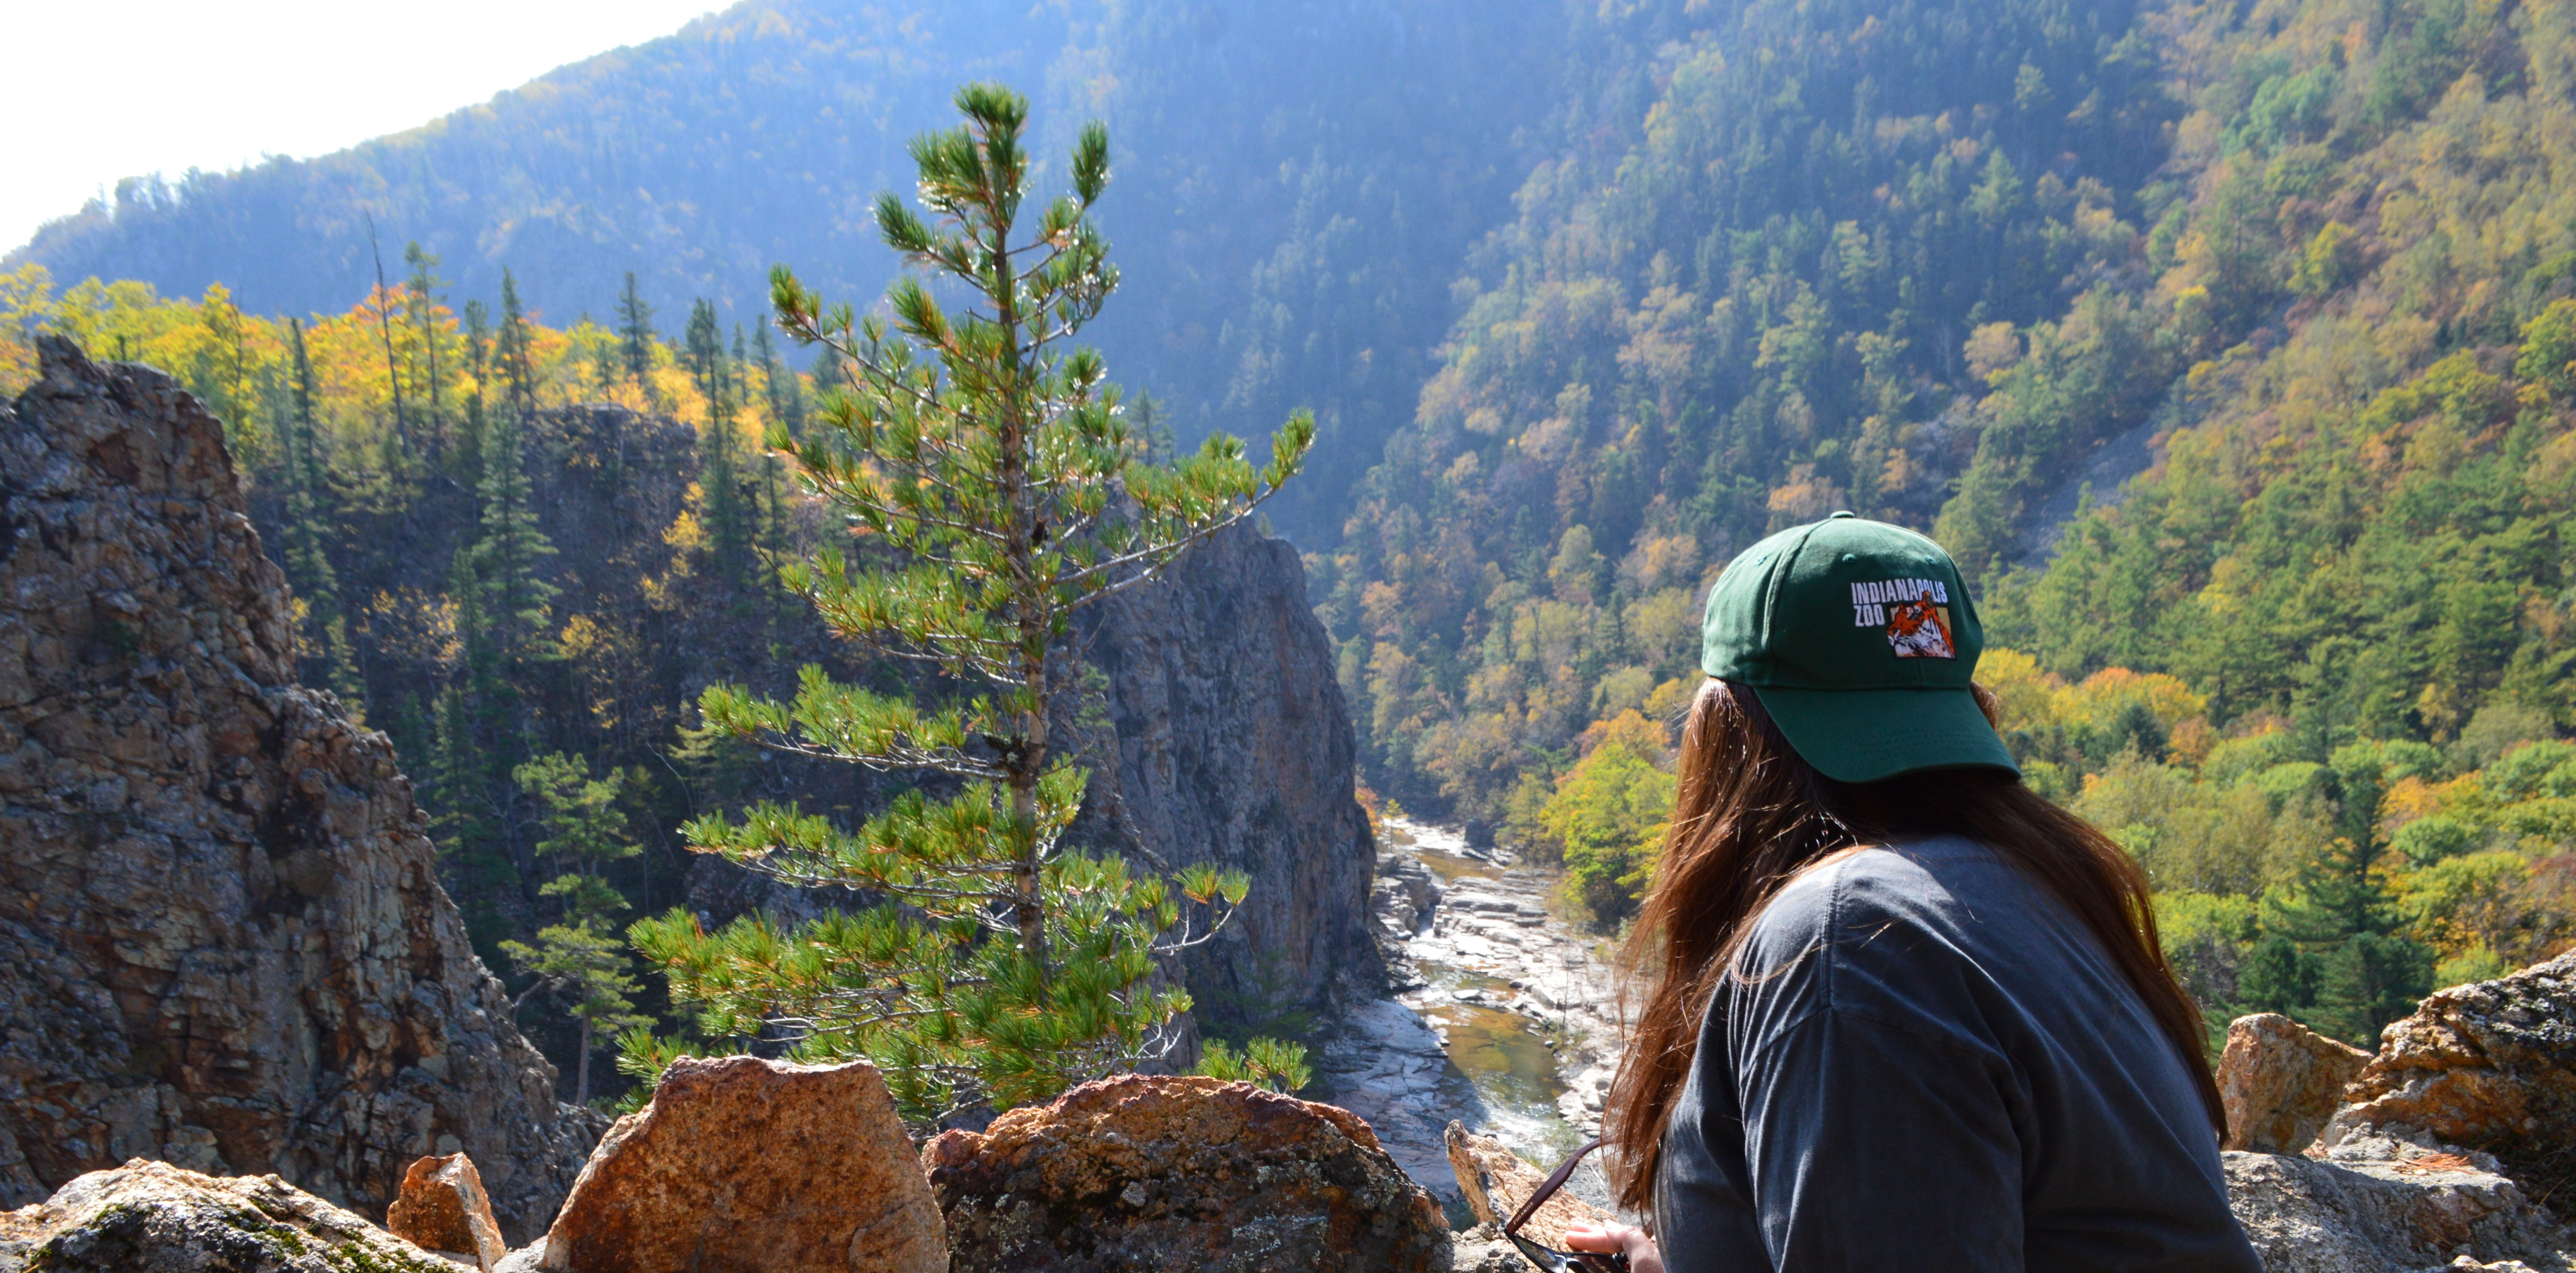 zovtigra national park